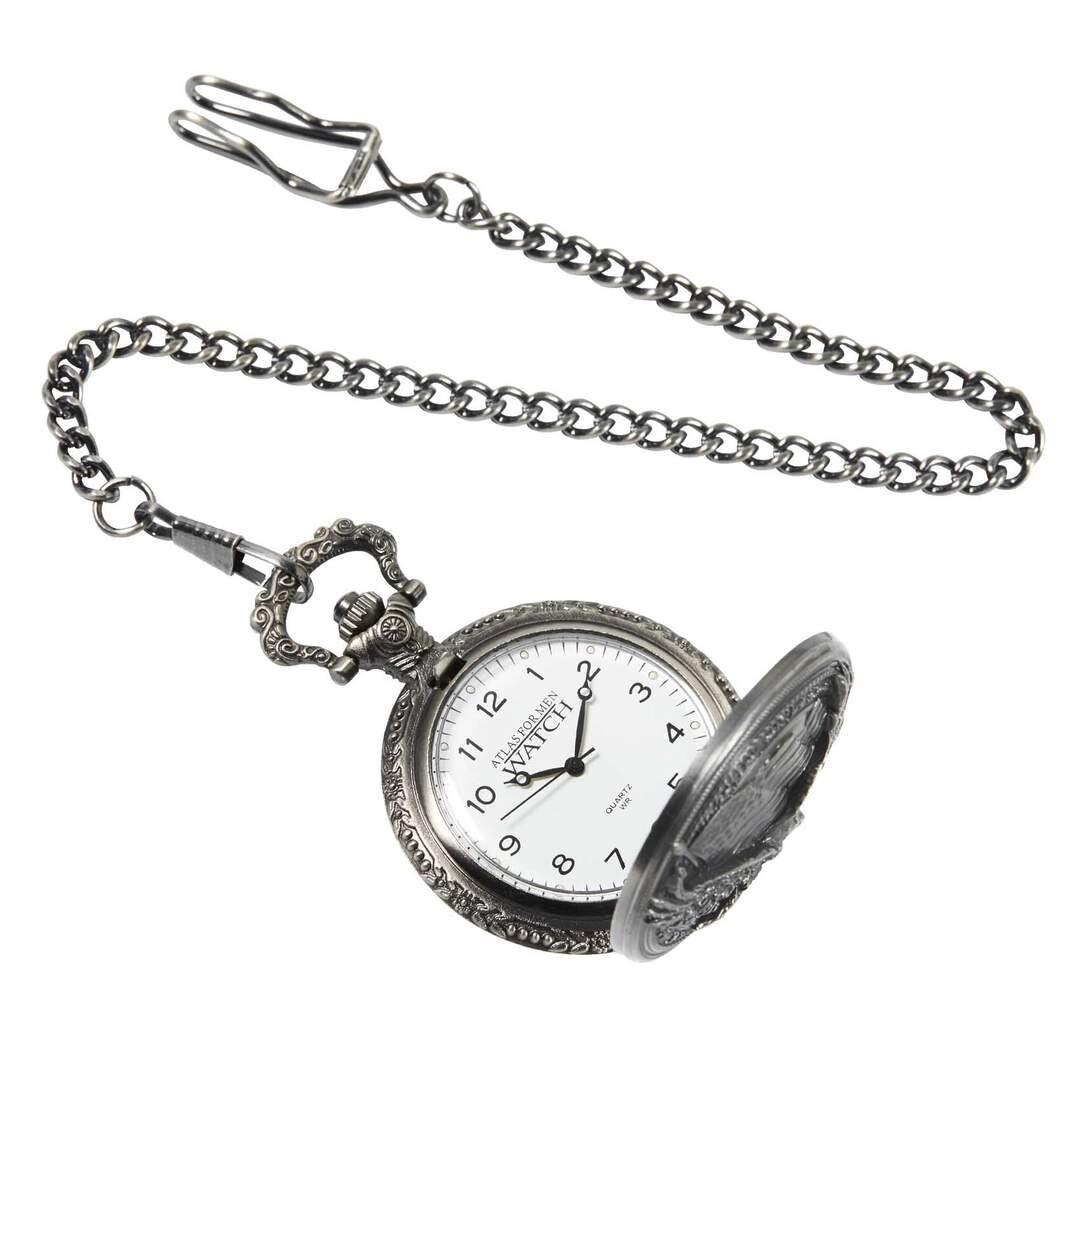 Men's Pocket Watch - Wild Eagle